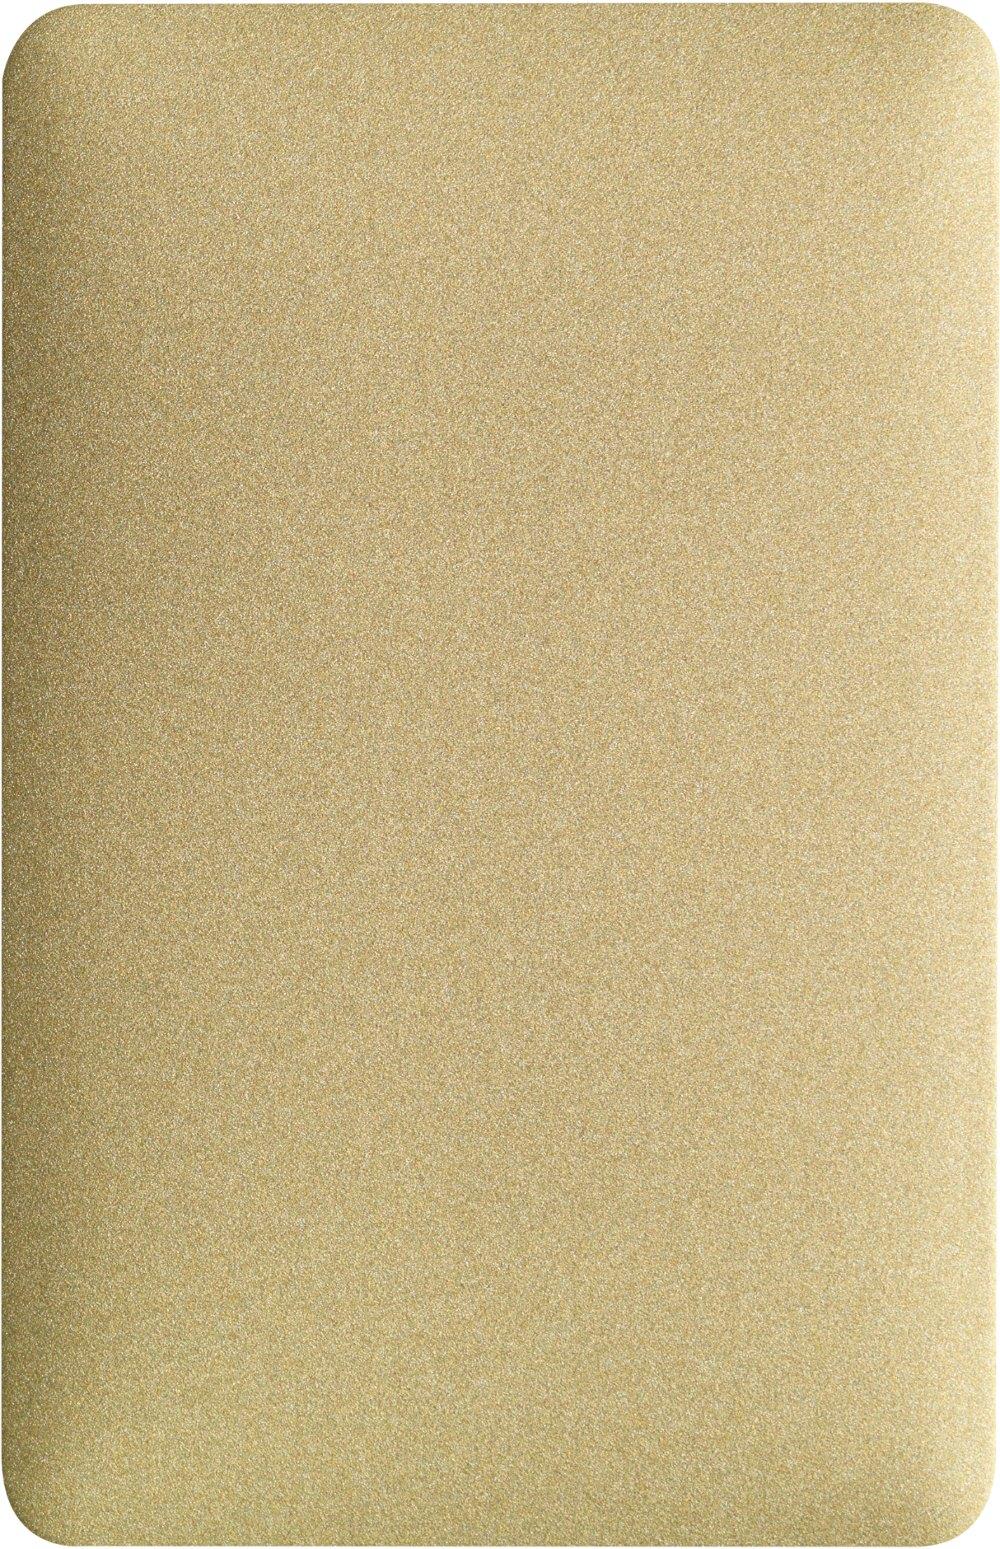 ECP  Anomax ultramatt anodized light gold